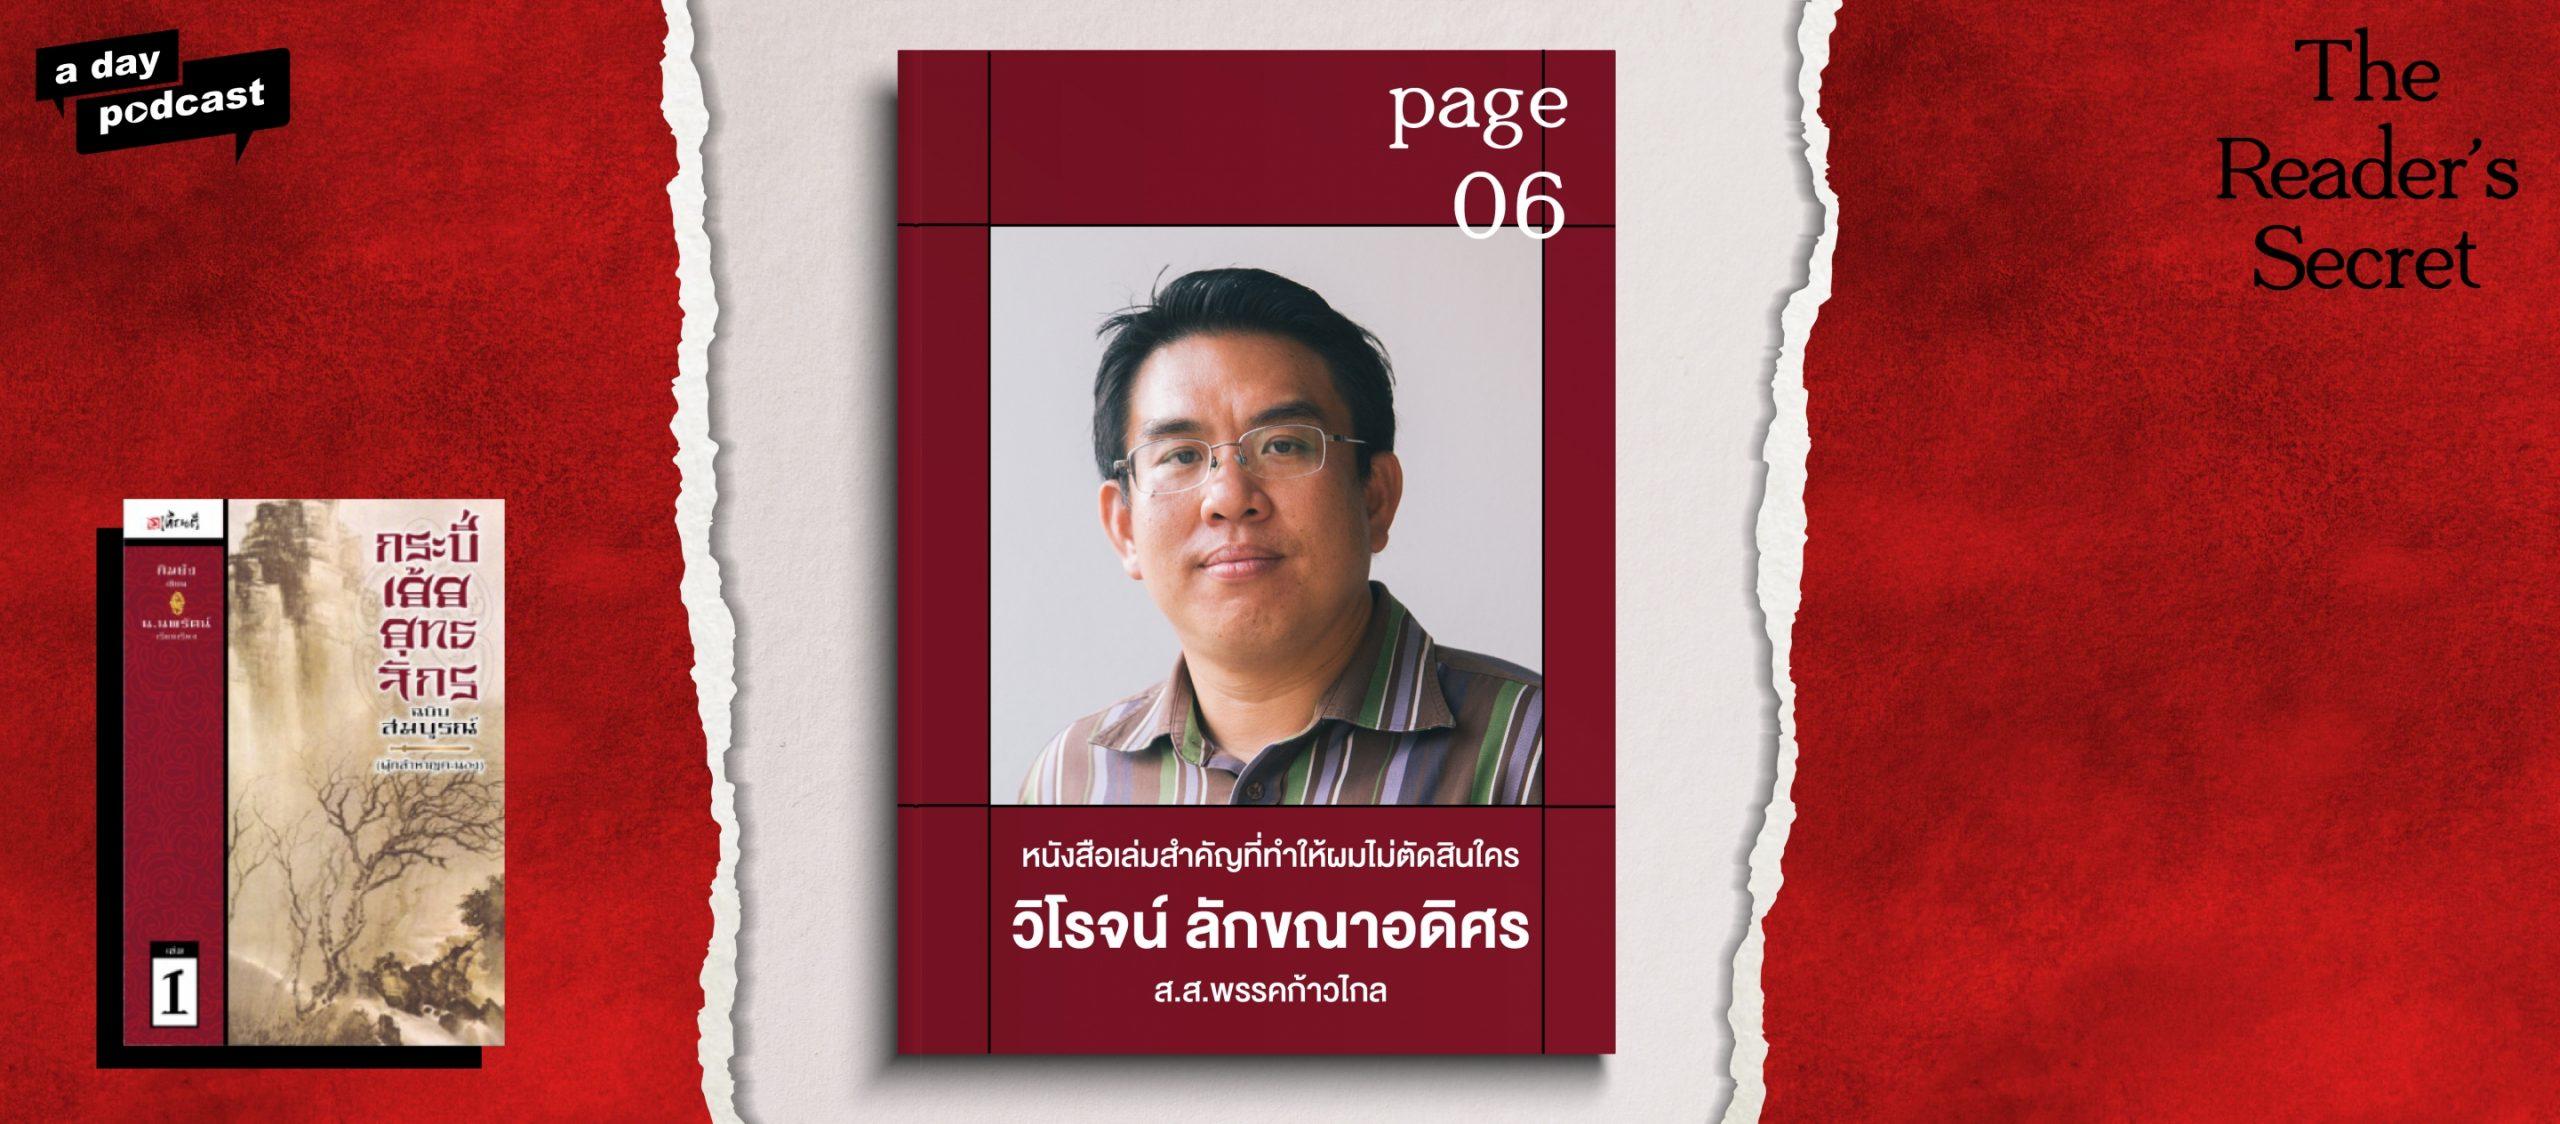 The Reader's Secret EP.06 หนังสือเล่มสำคัญที่ทำให้ วิโรจน์ ลักขณาอดิศร ไม่ตัดสินใคร